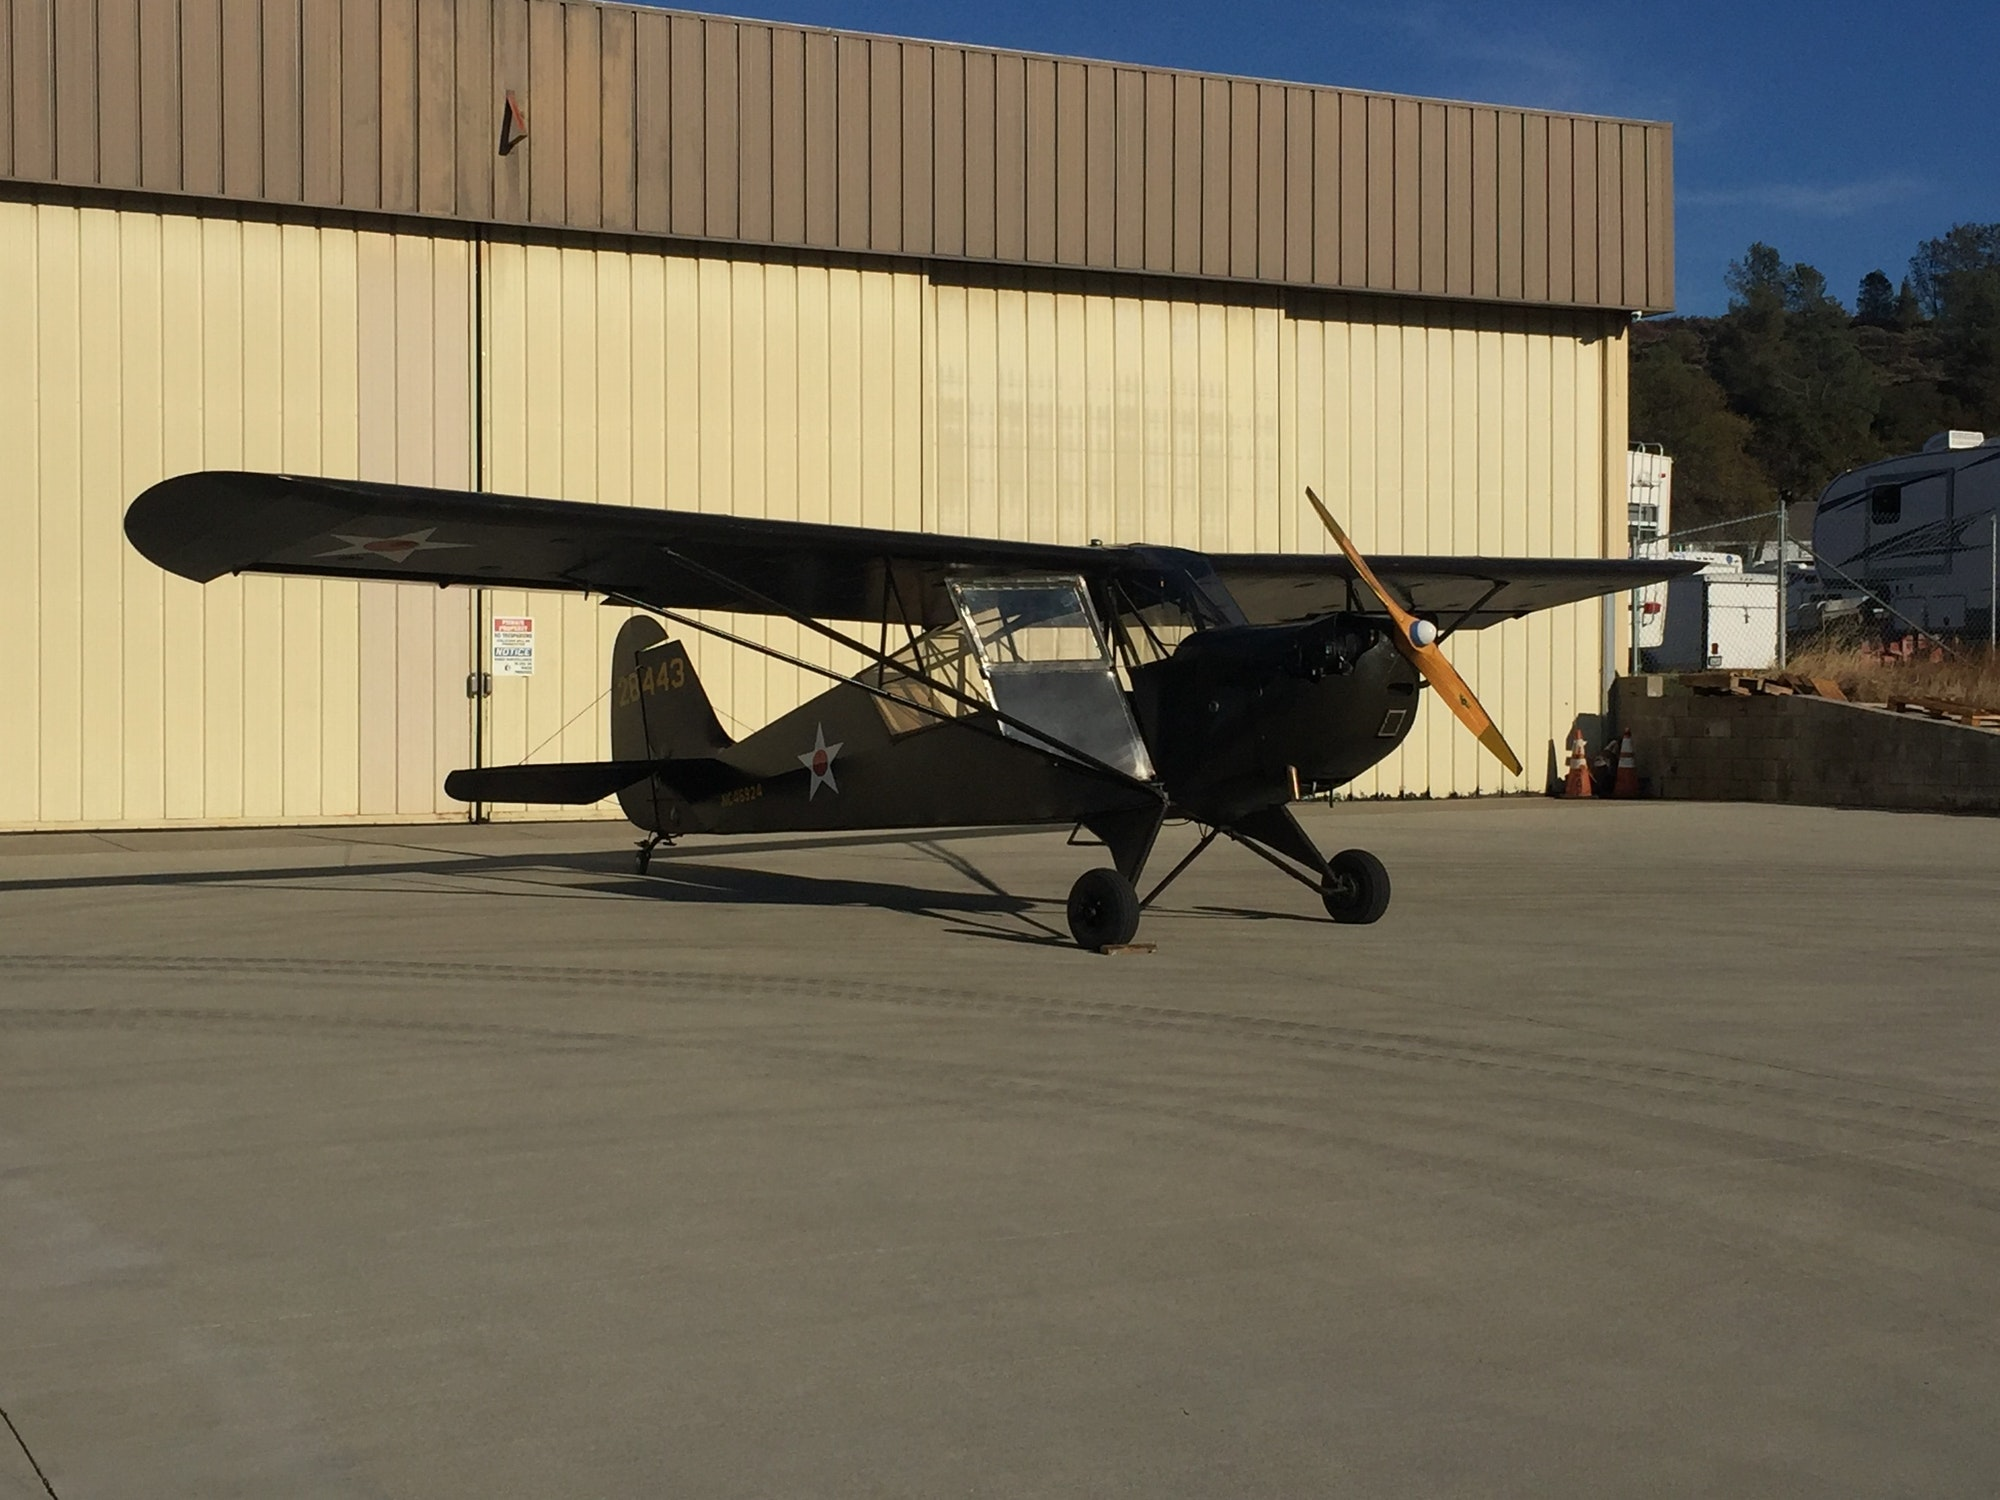 May contain: hangar, building, airplane, transportation, vehicle, and aircraft